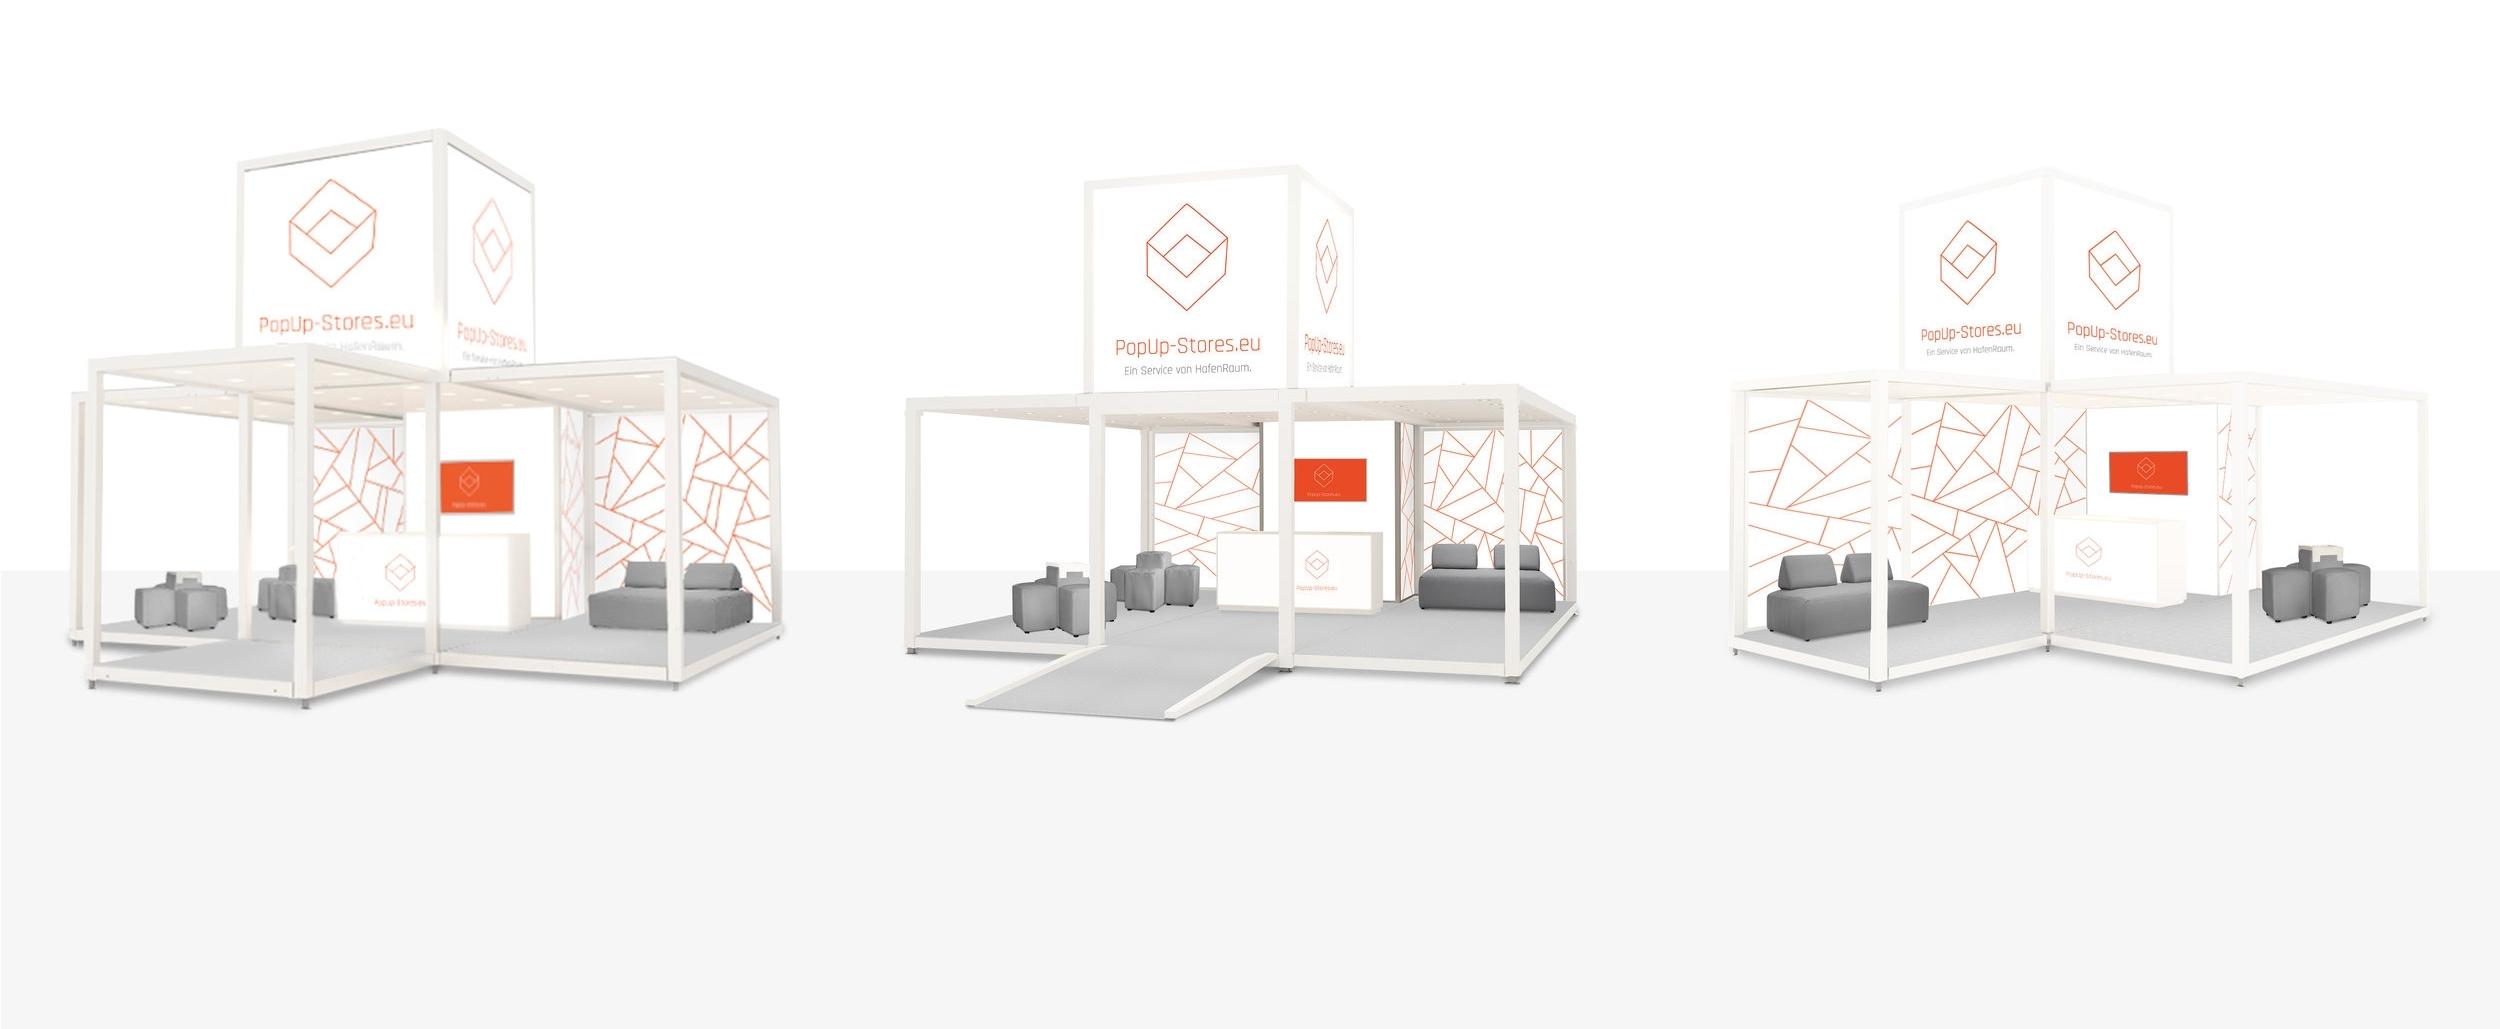 PromoCubes-PopUp-Stores.eu